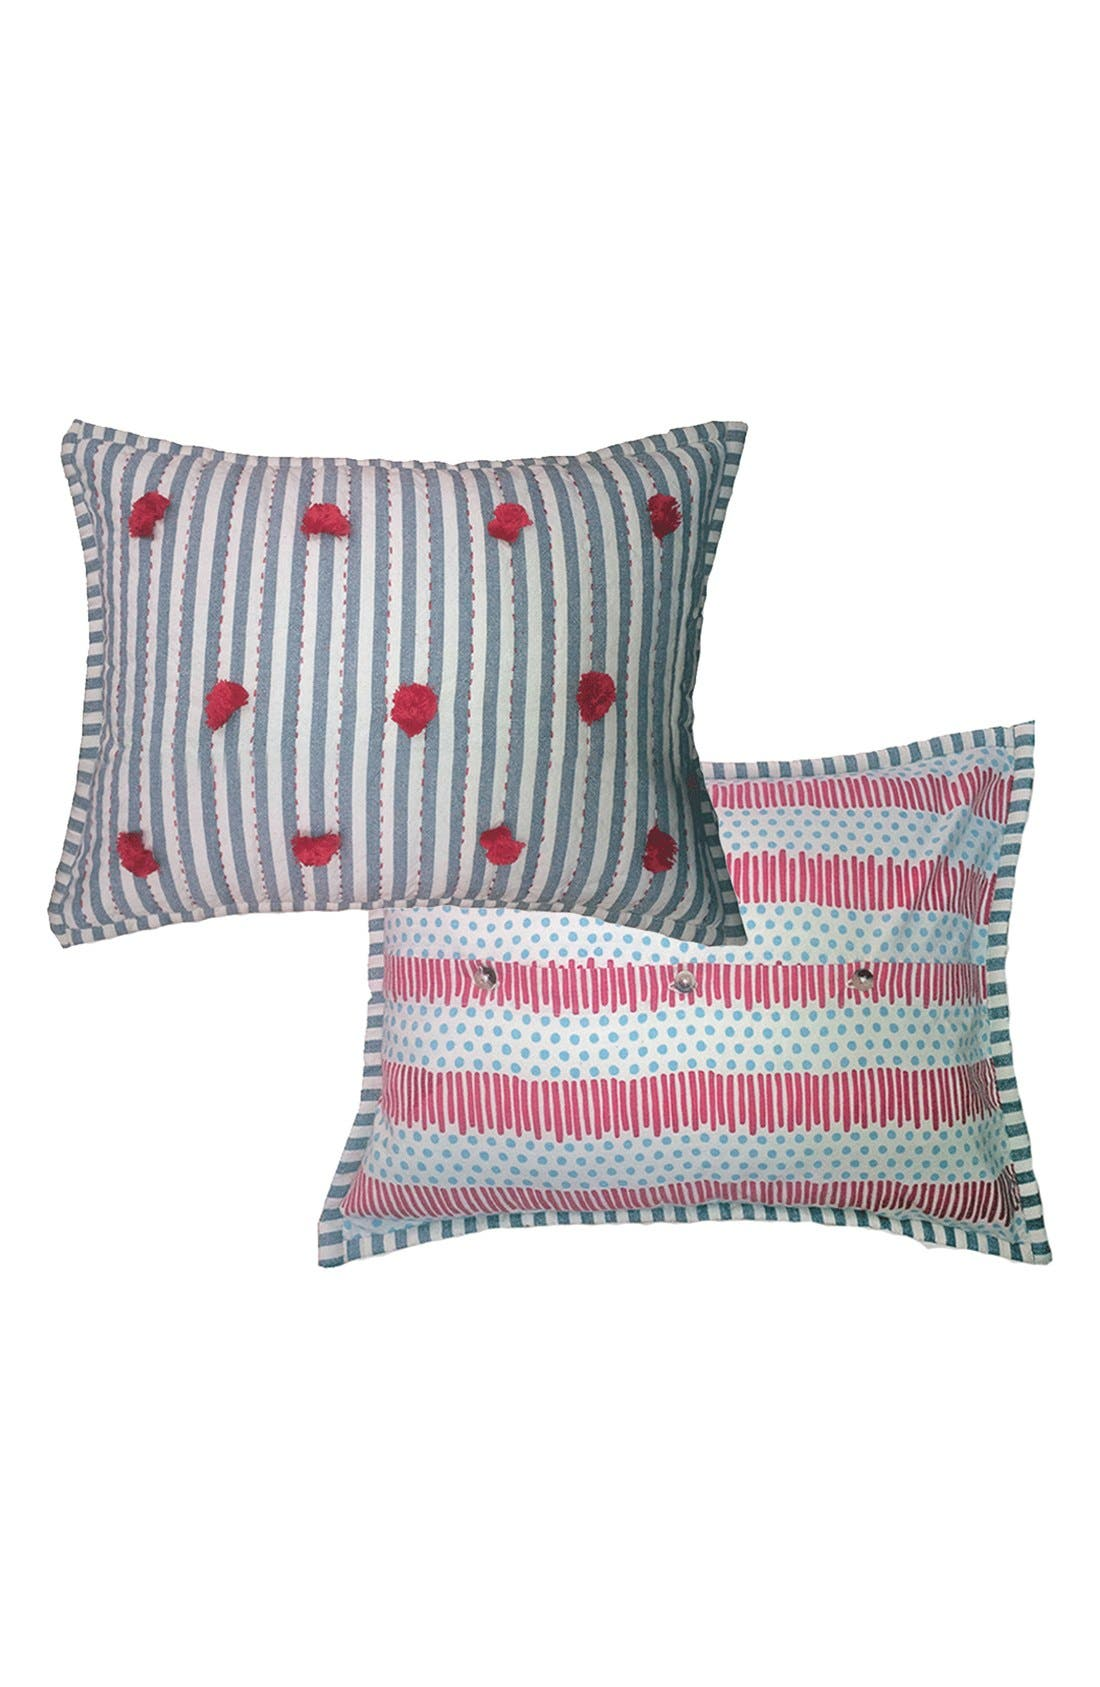 Main Image - Petit Pehr 'Rest My Little Head' Cotton Pillow